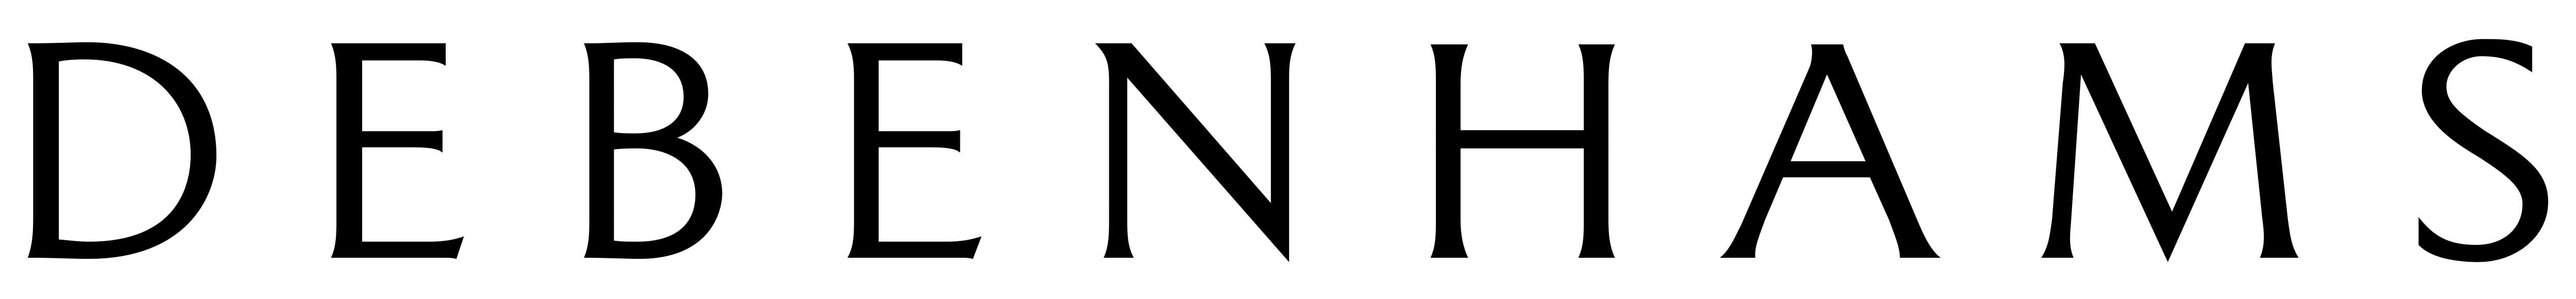 Debenhams_logo_wordmark.png